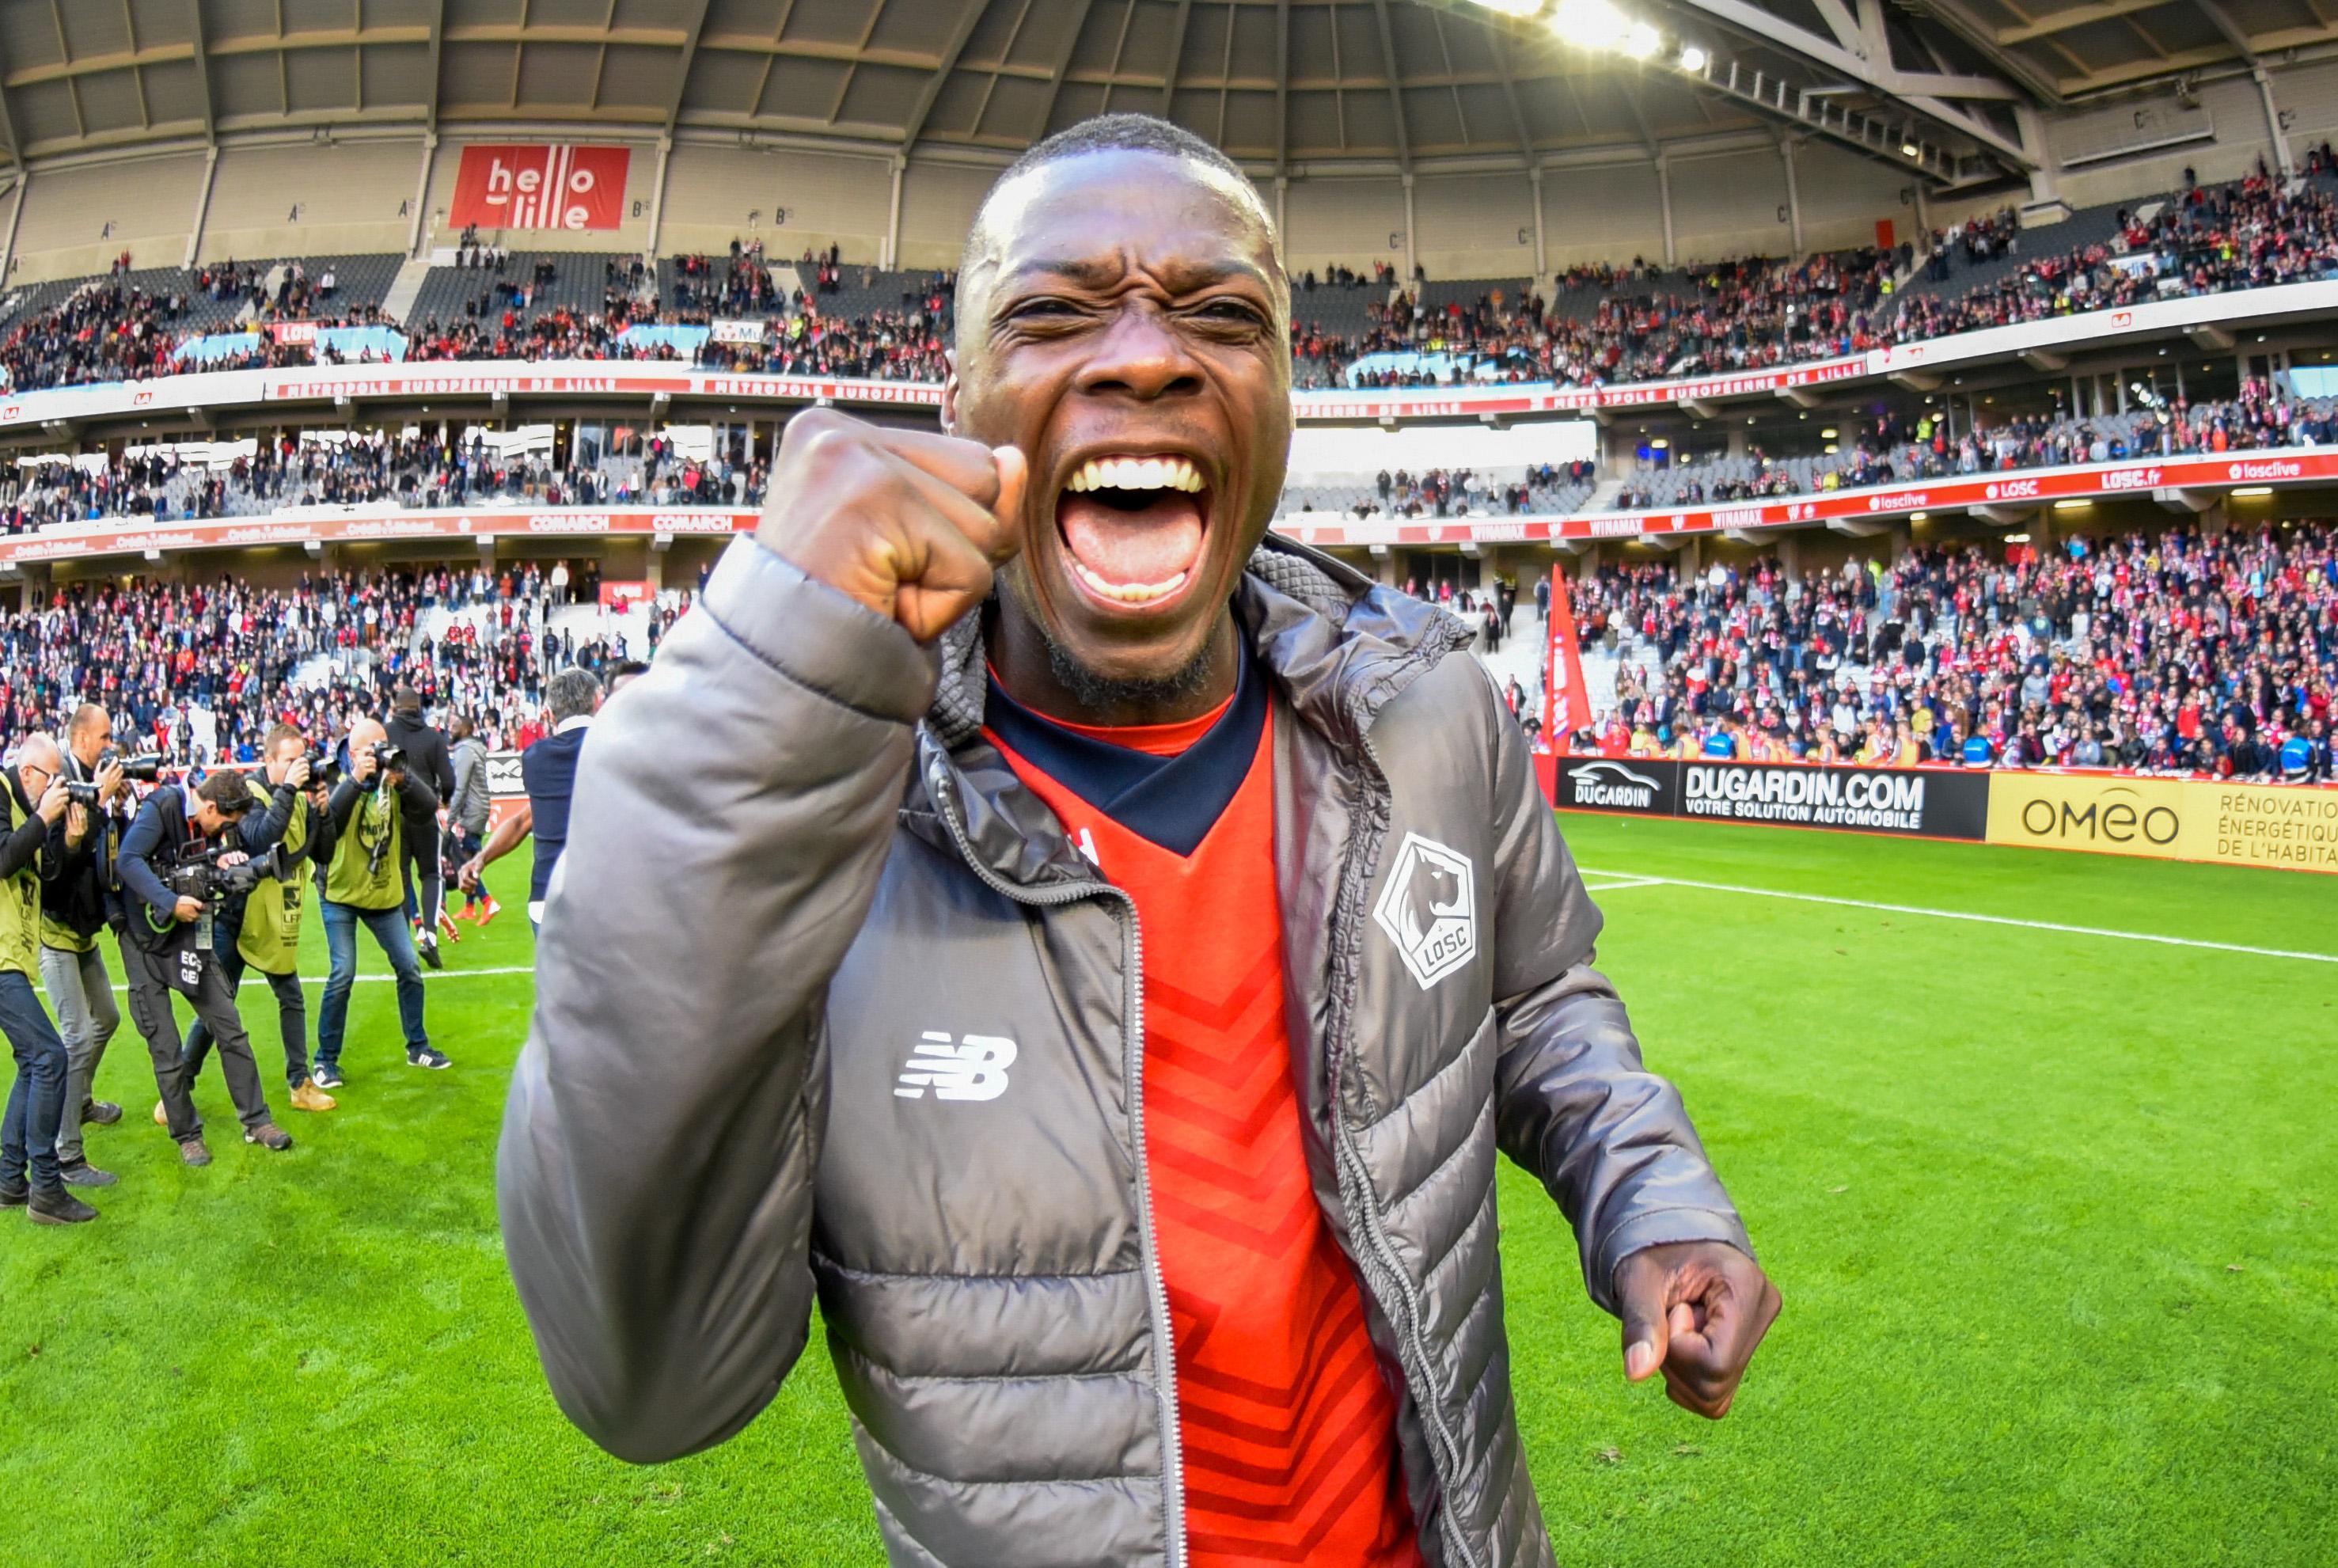 Kean Pepe Gueye Les Infos Mercato A Retenir Ce Mardi Transferts Football